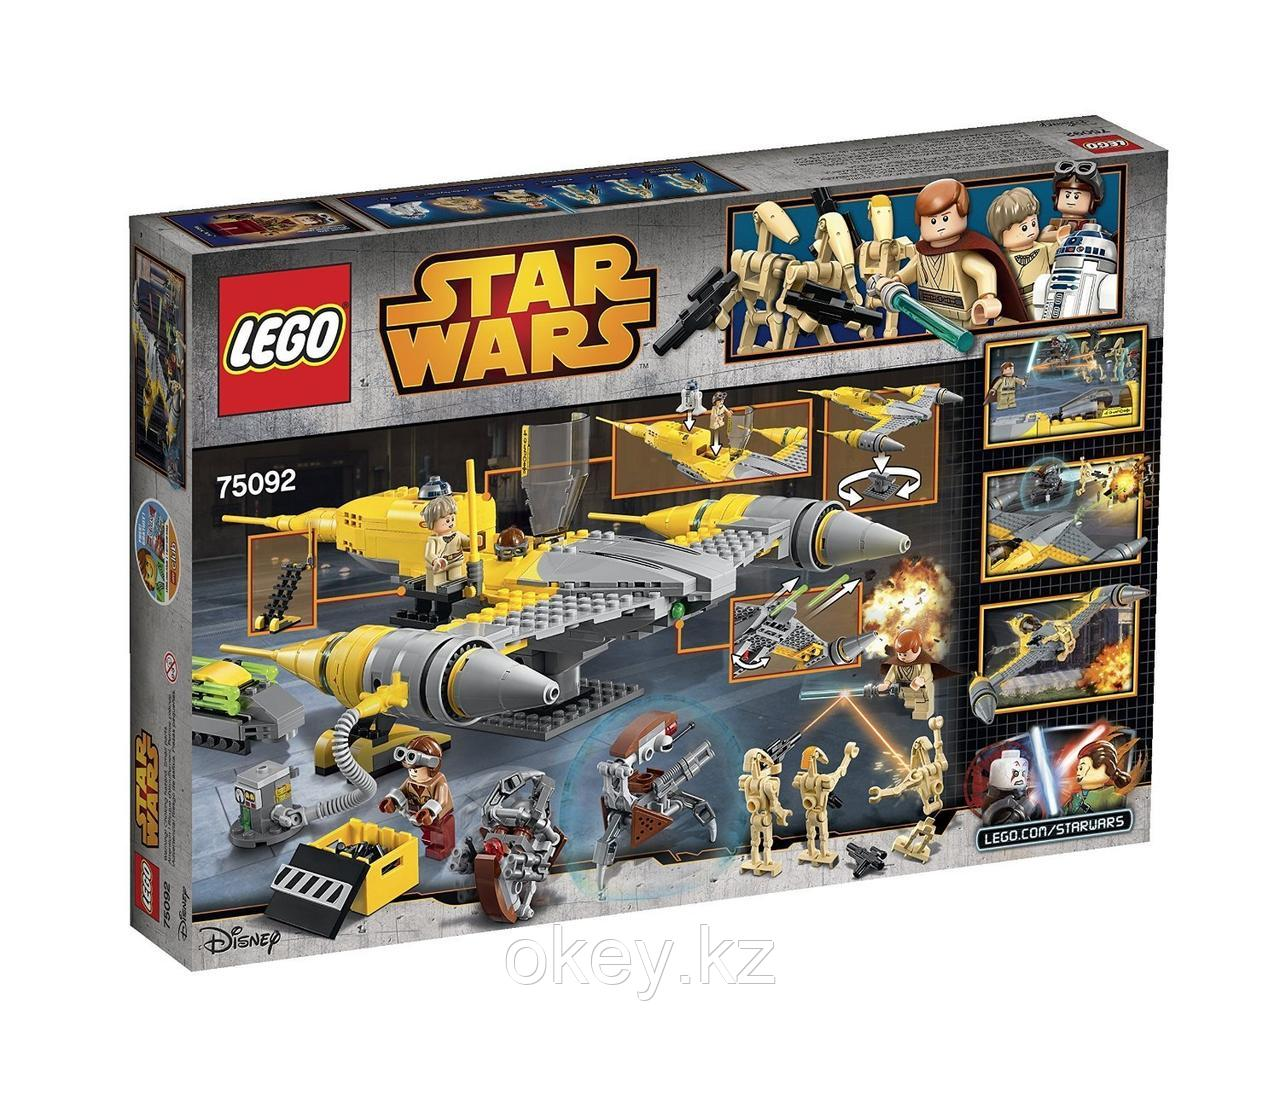 LEGO Star Wars: Истребитель Набу 75092 - фото 2